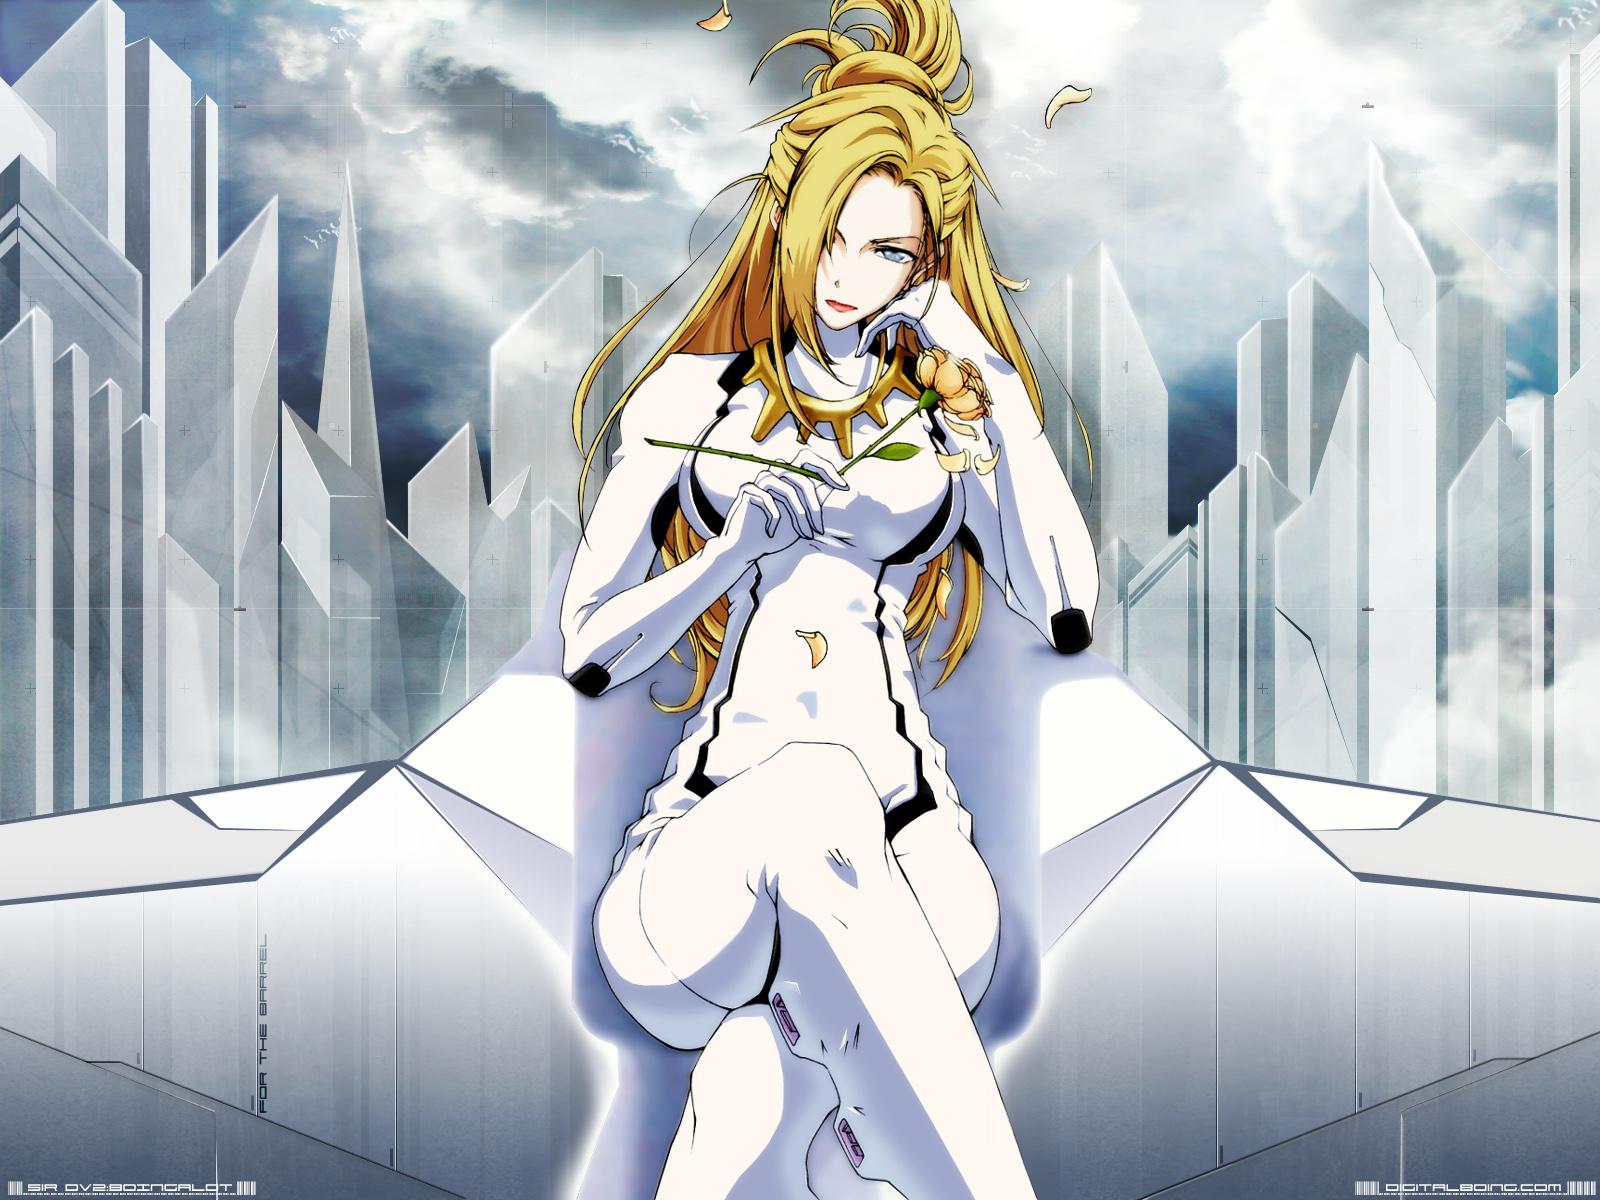 Gundam For The Barrel: Wallpapers Mobile Suit Gundam Anime